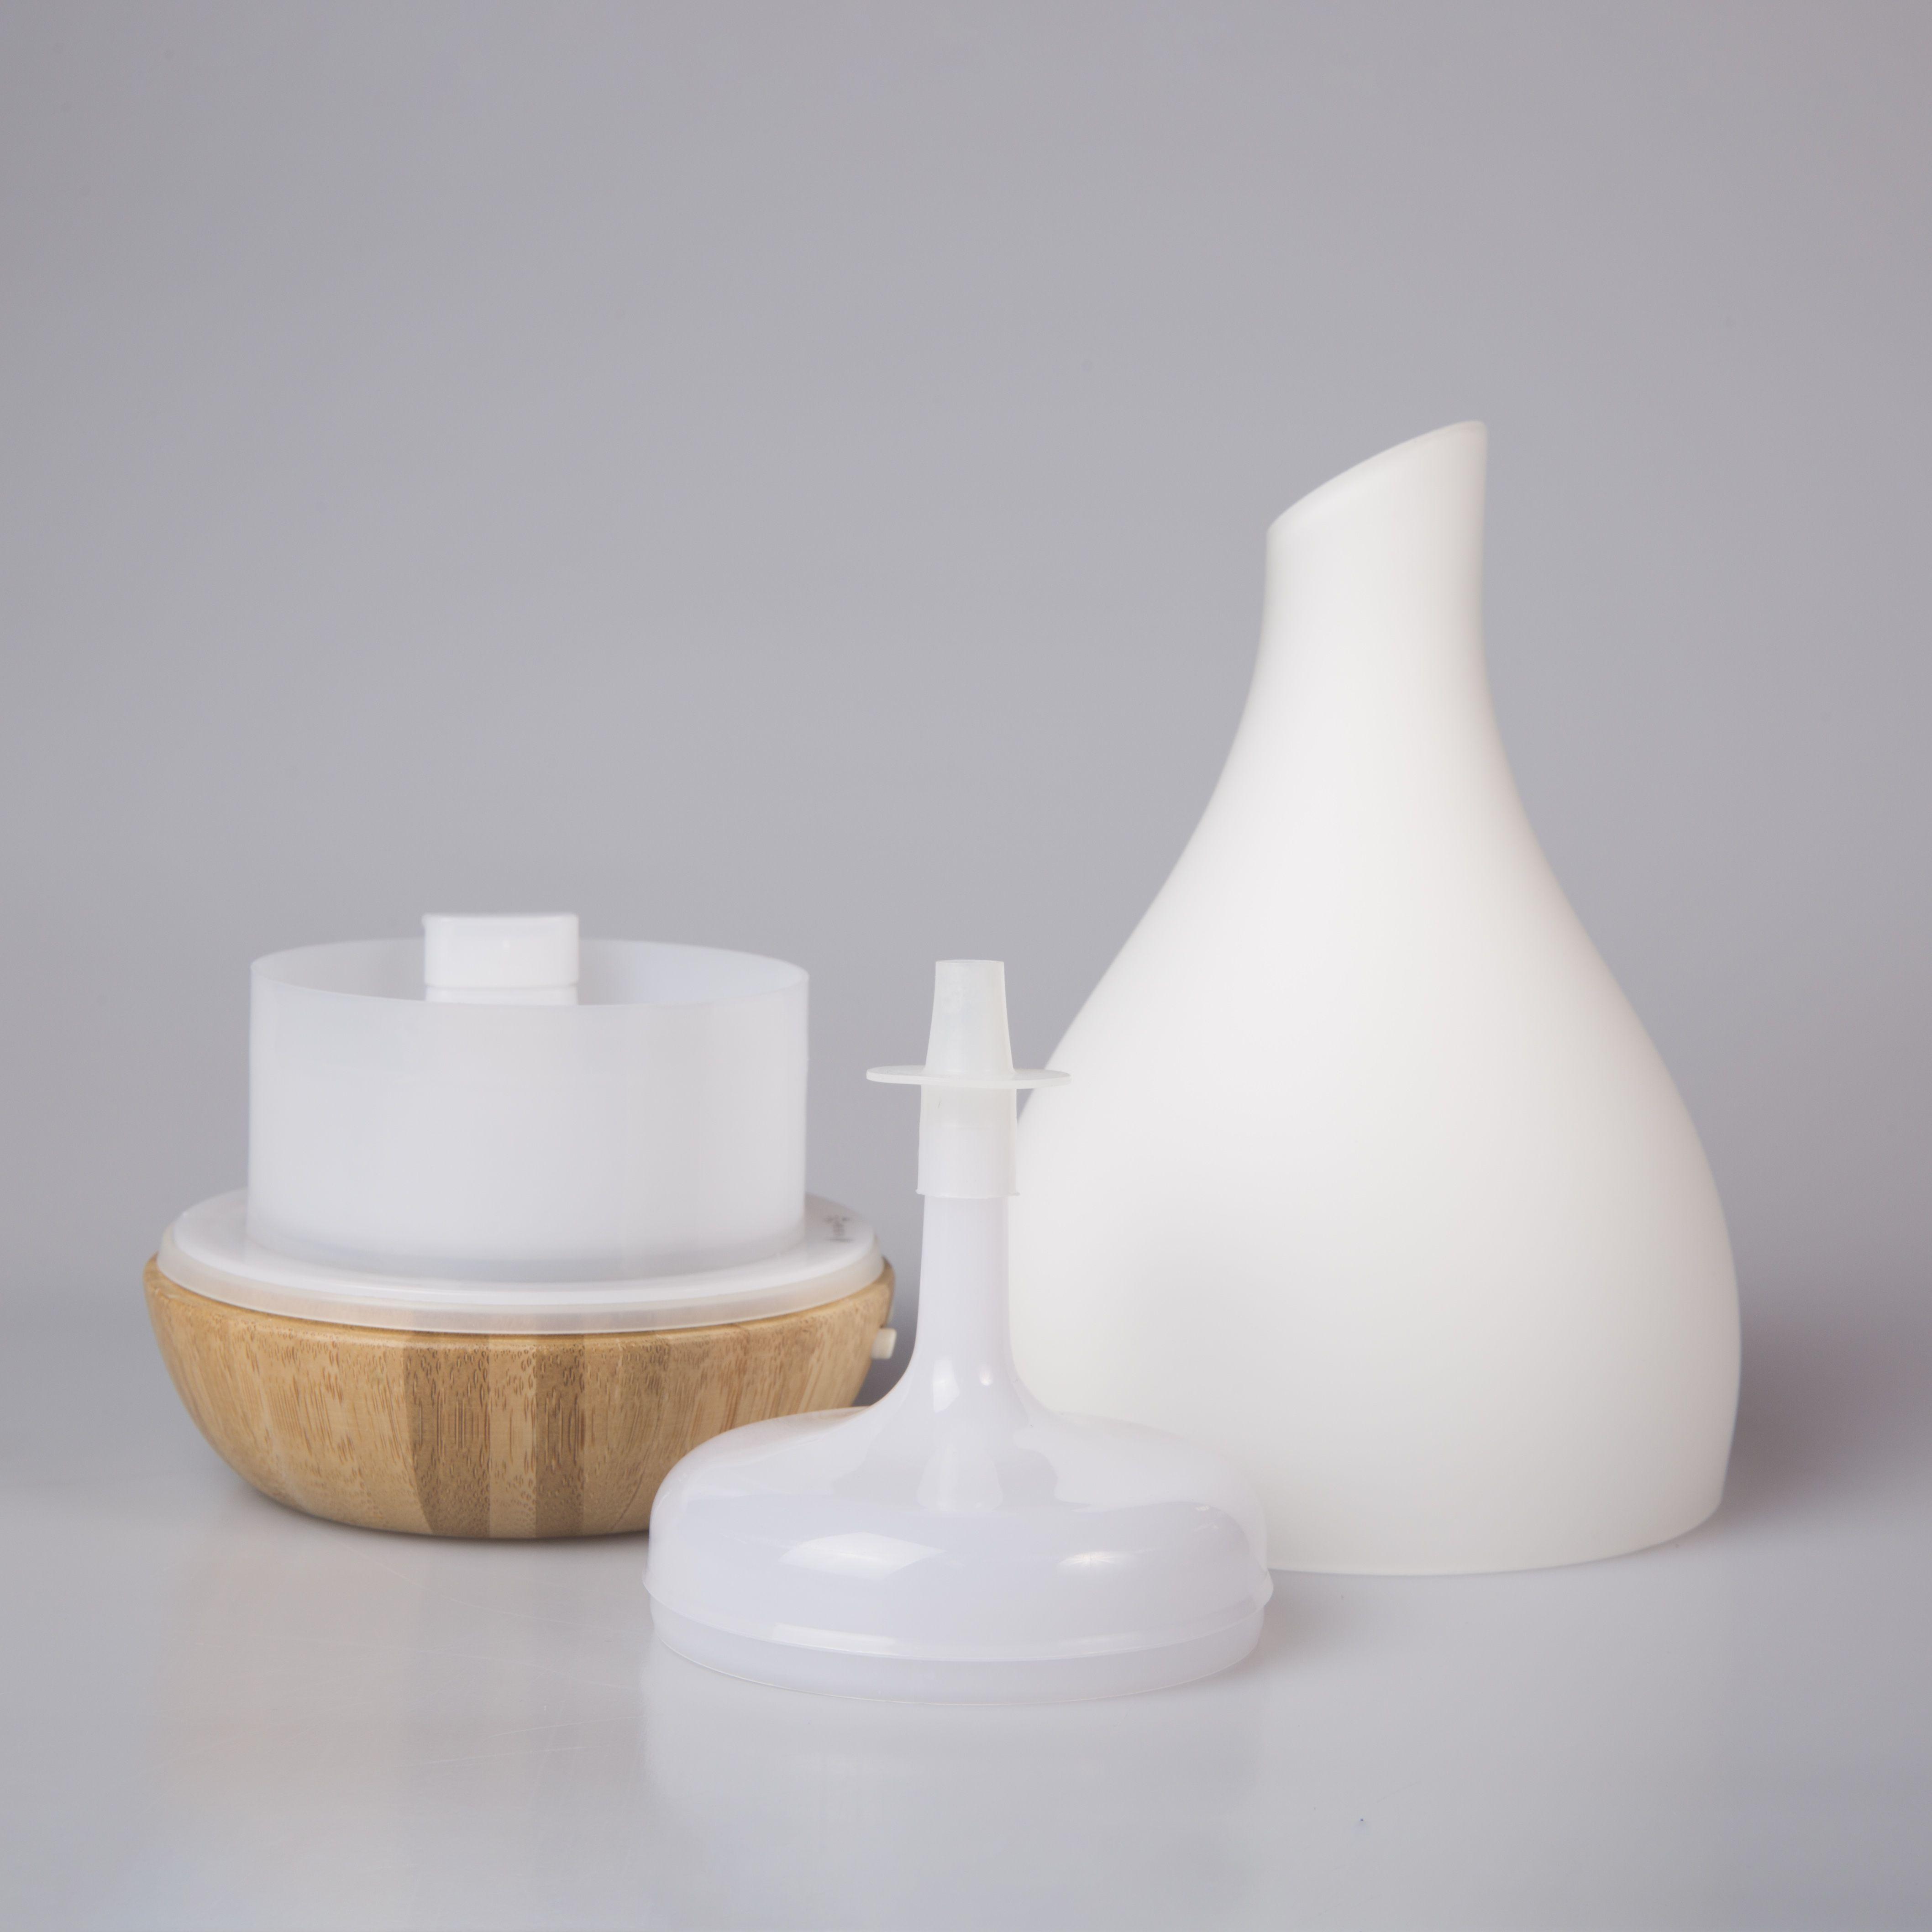 Beautiful Design Glass Aromtherapy Ultrasonic Oil Diffuser